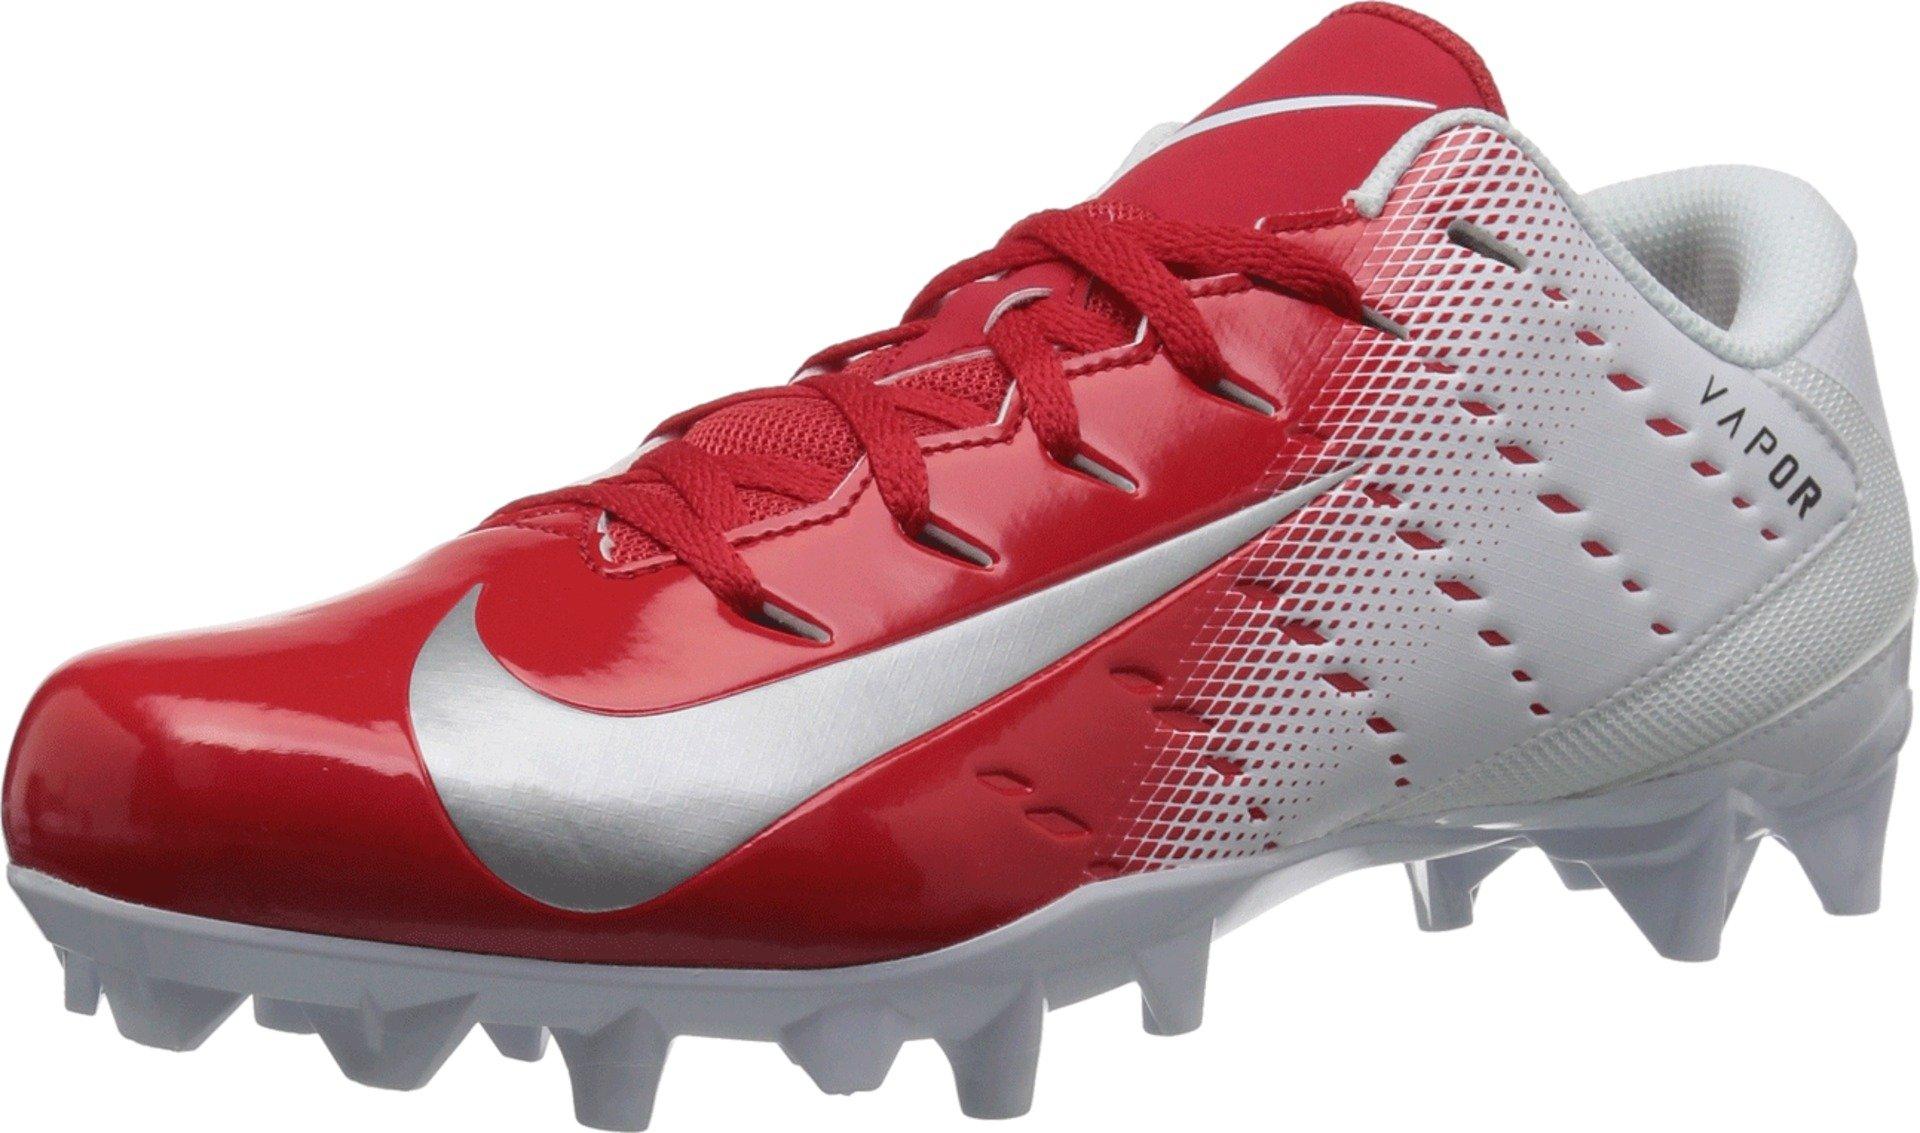 Nike Men's Vapor Untouchable Varsity 3 TD Football Cleat White/Metallic Silver/University Red Size 9 M US by Nike